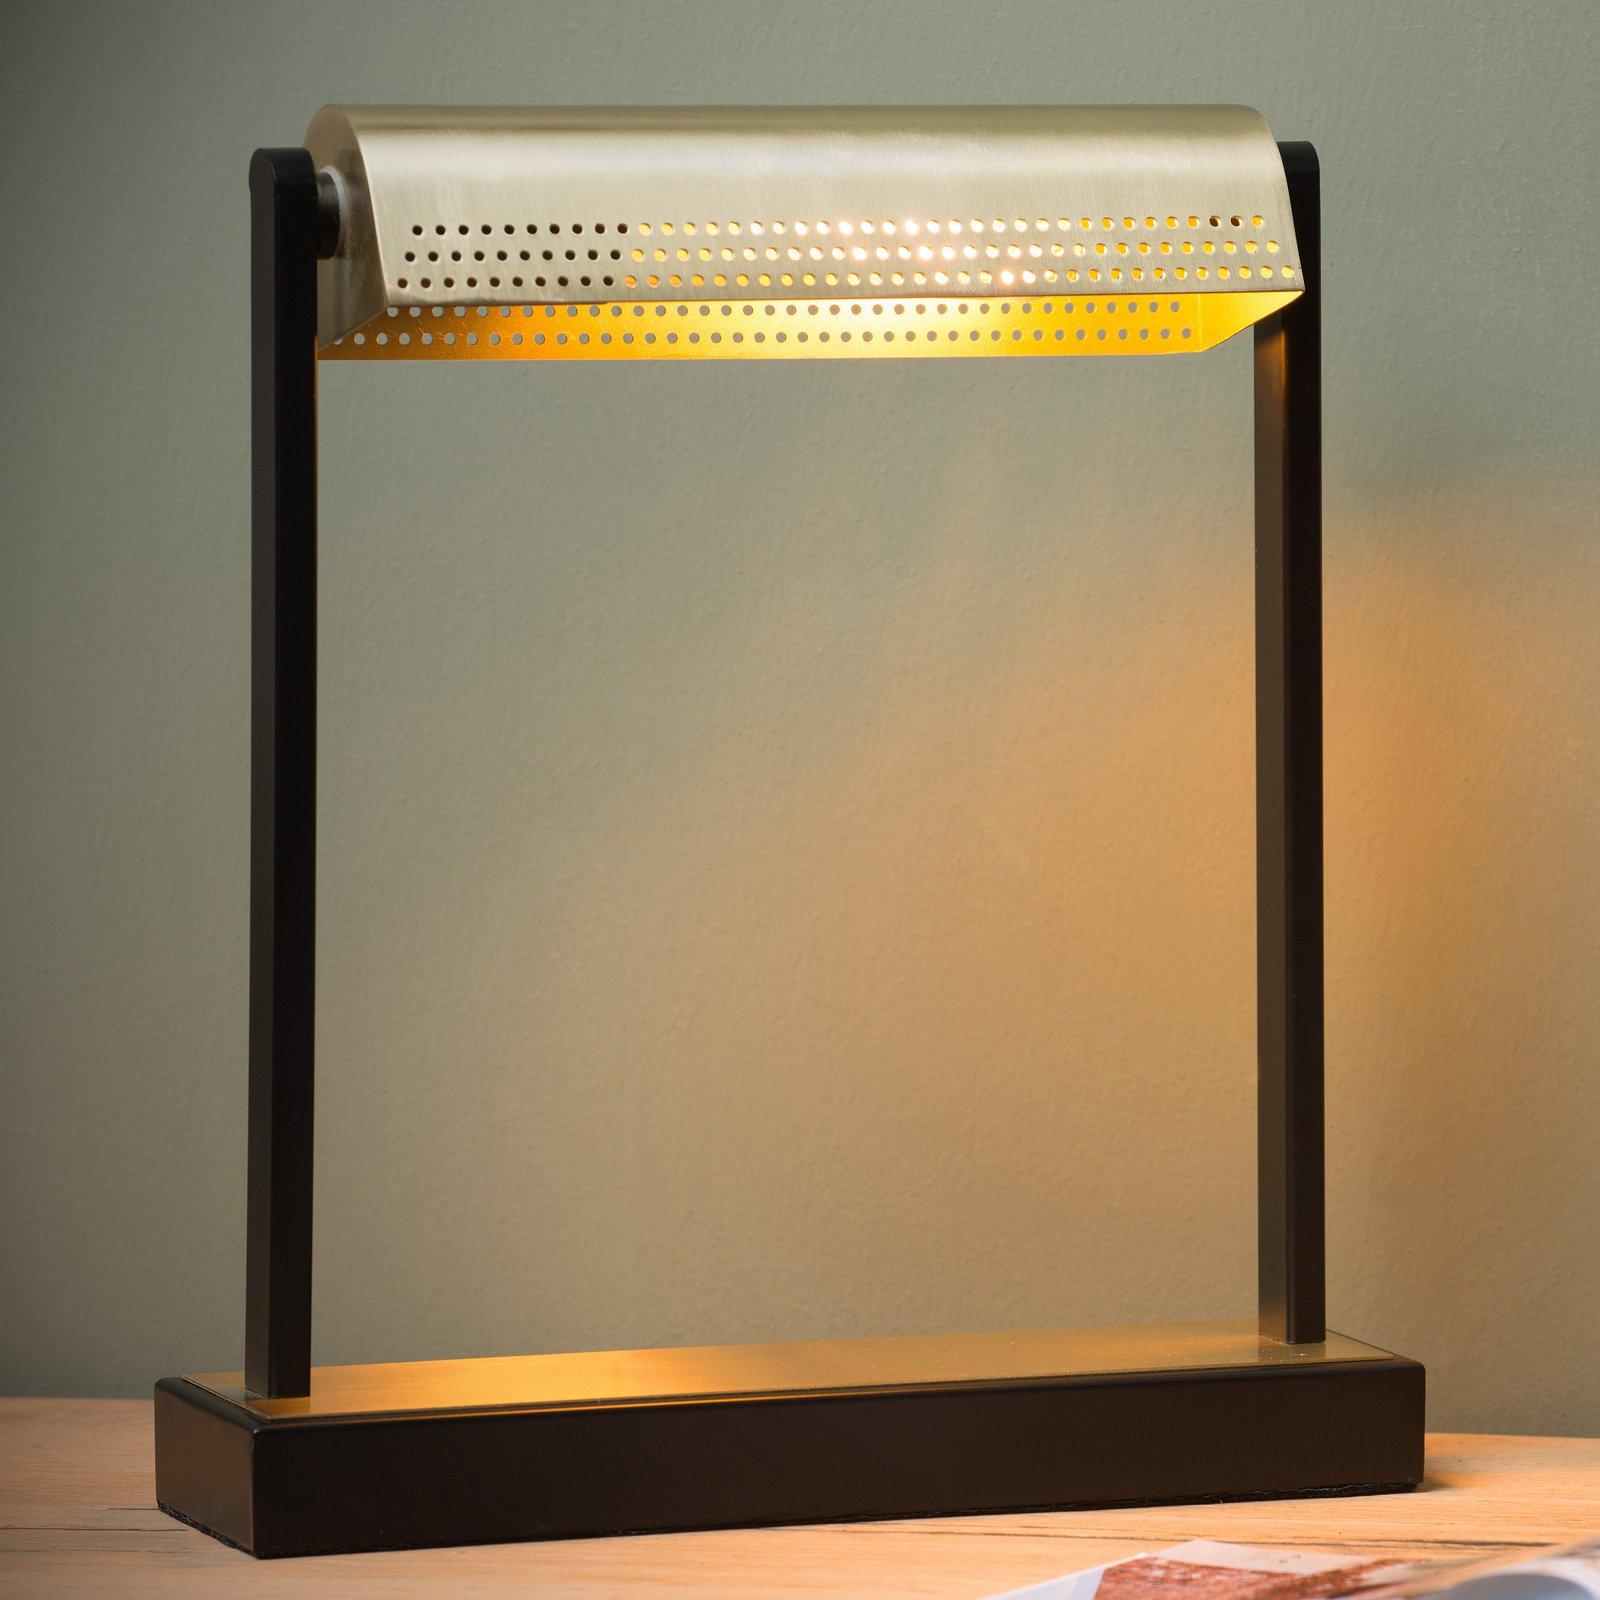 Laut bordlampe svart, matt gull